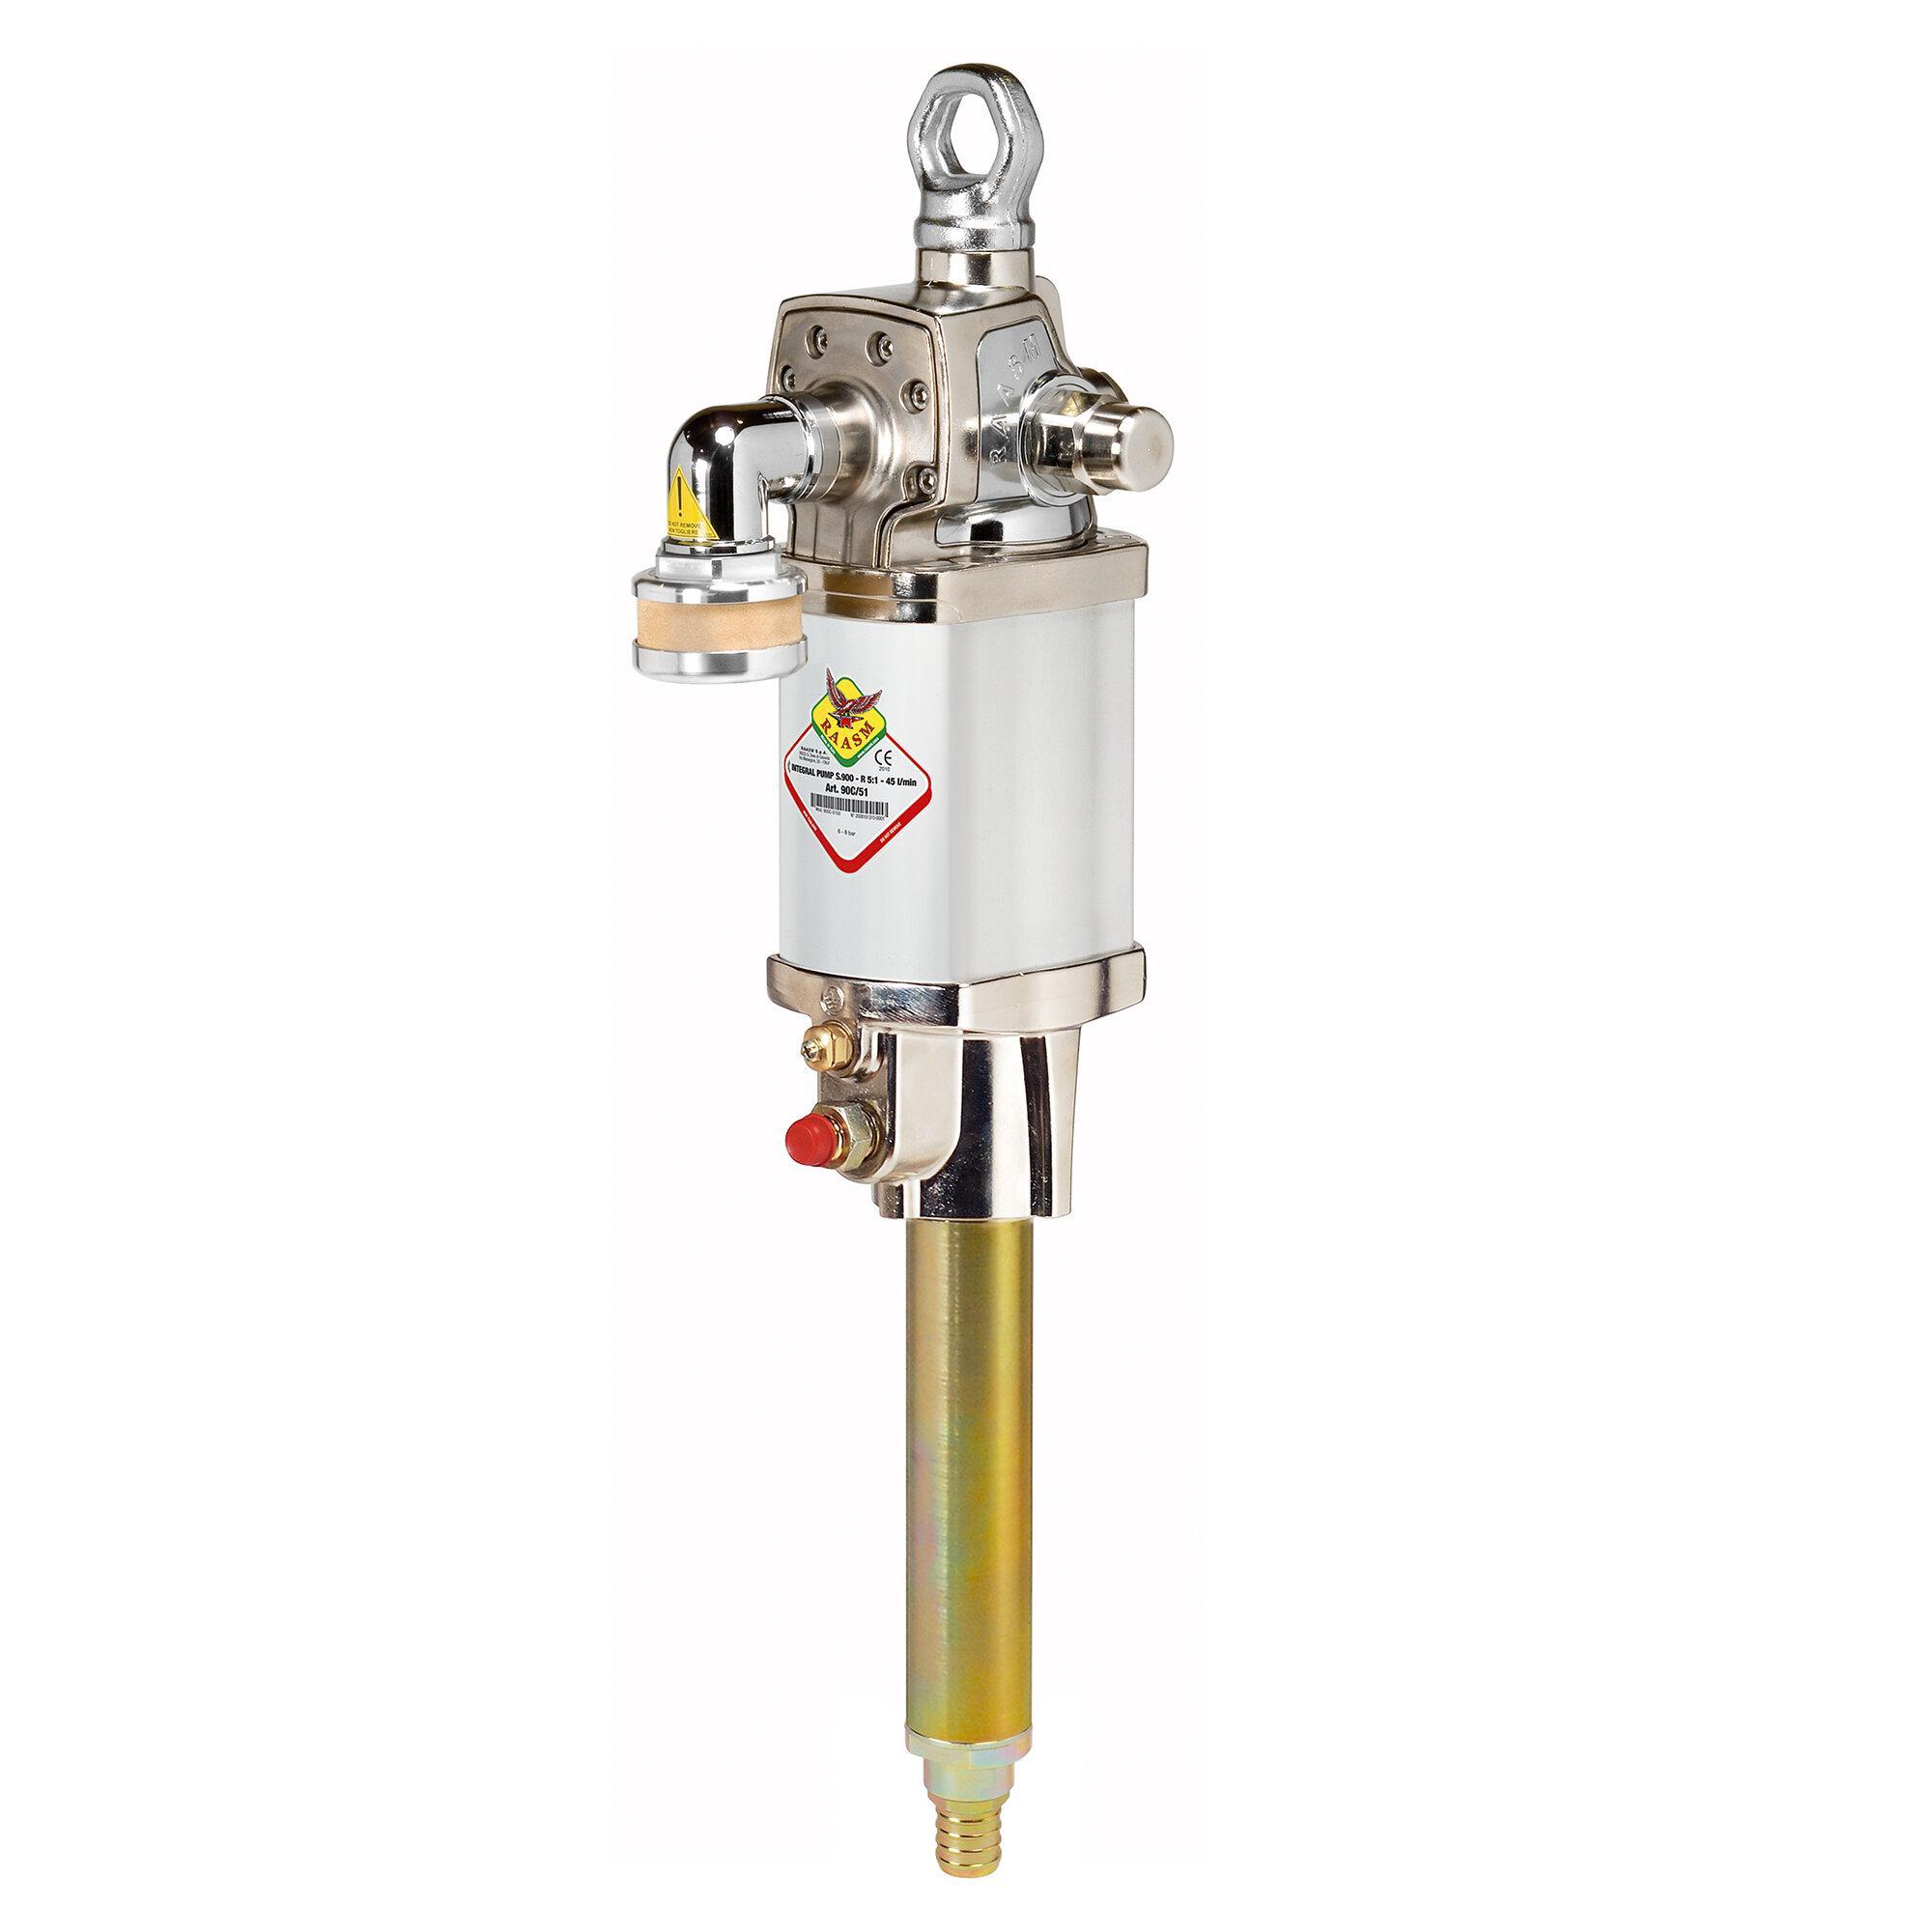 90C.111 - 11:1 Ratio, High Volume Oil Pump Stub